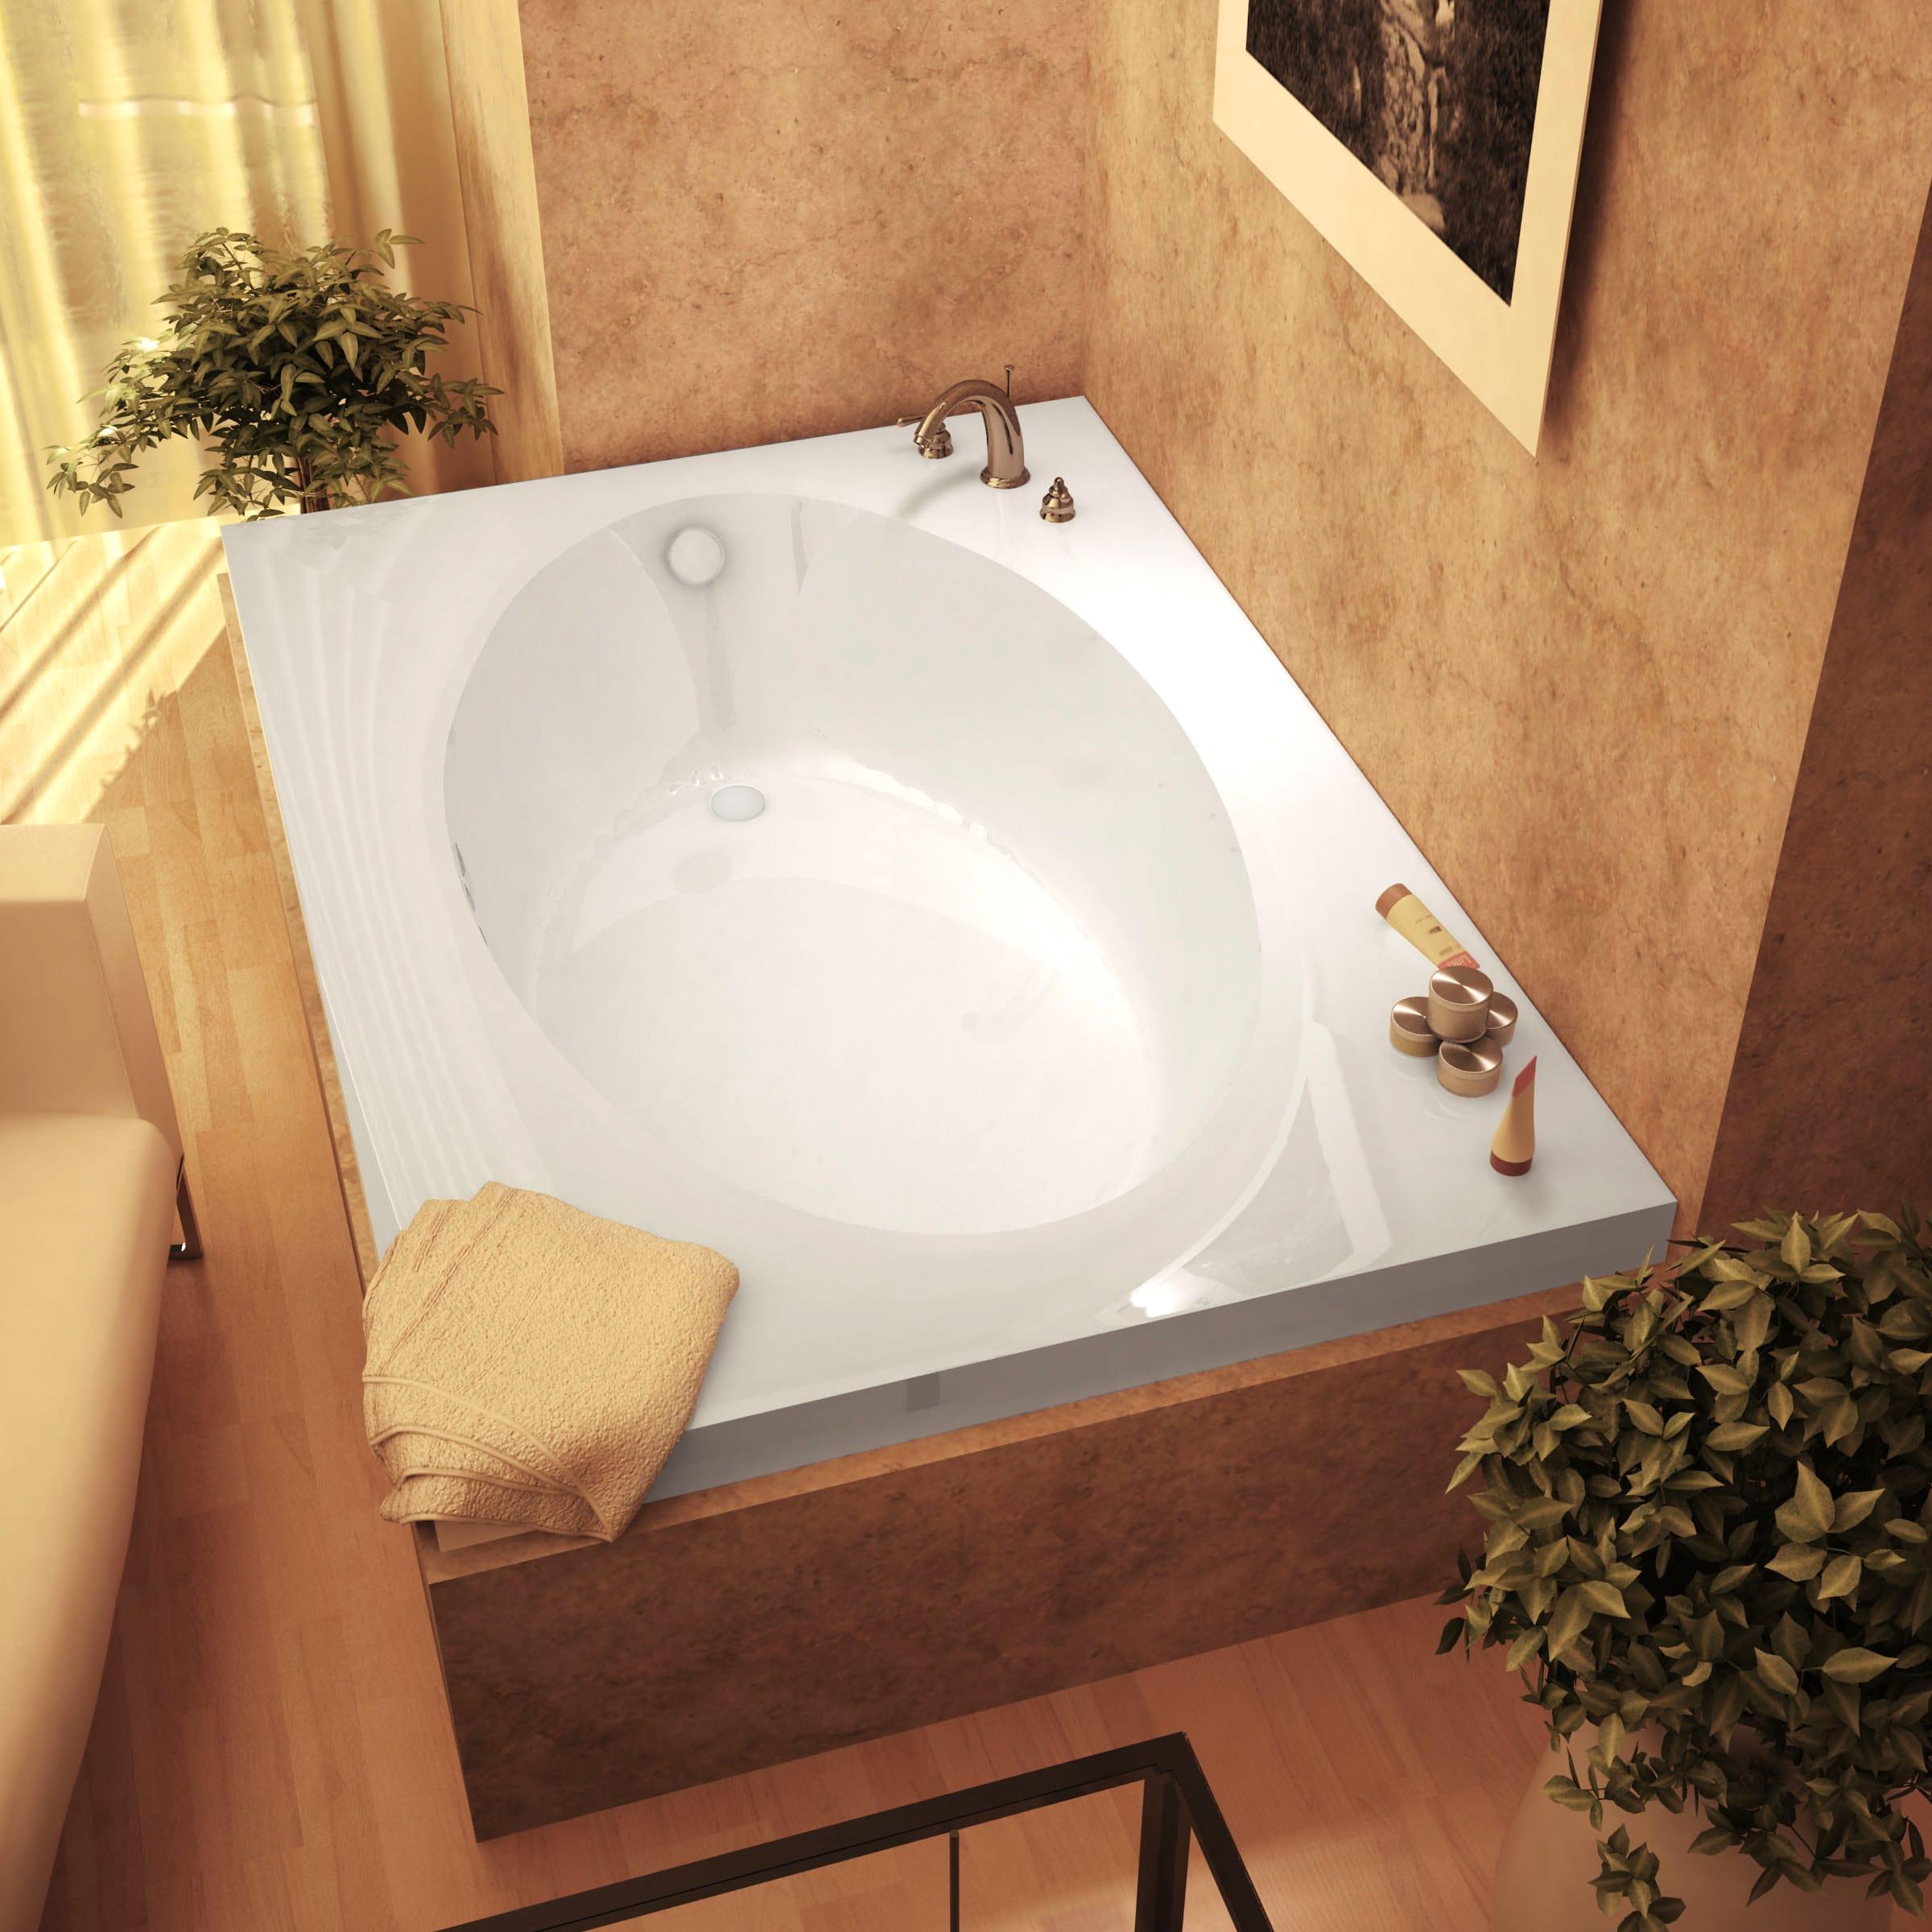 Mountain Home Vail 42x60-inch Acrylic Soaking Drop-in Bathtub | eBay